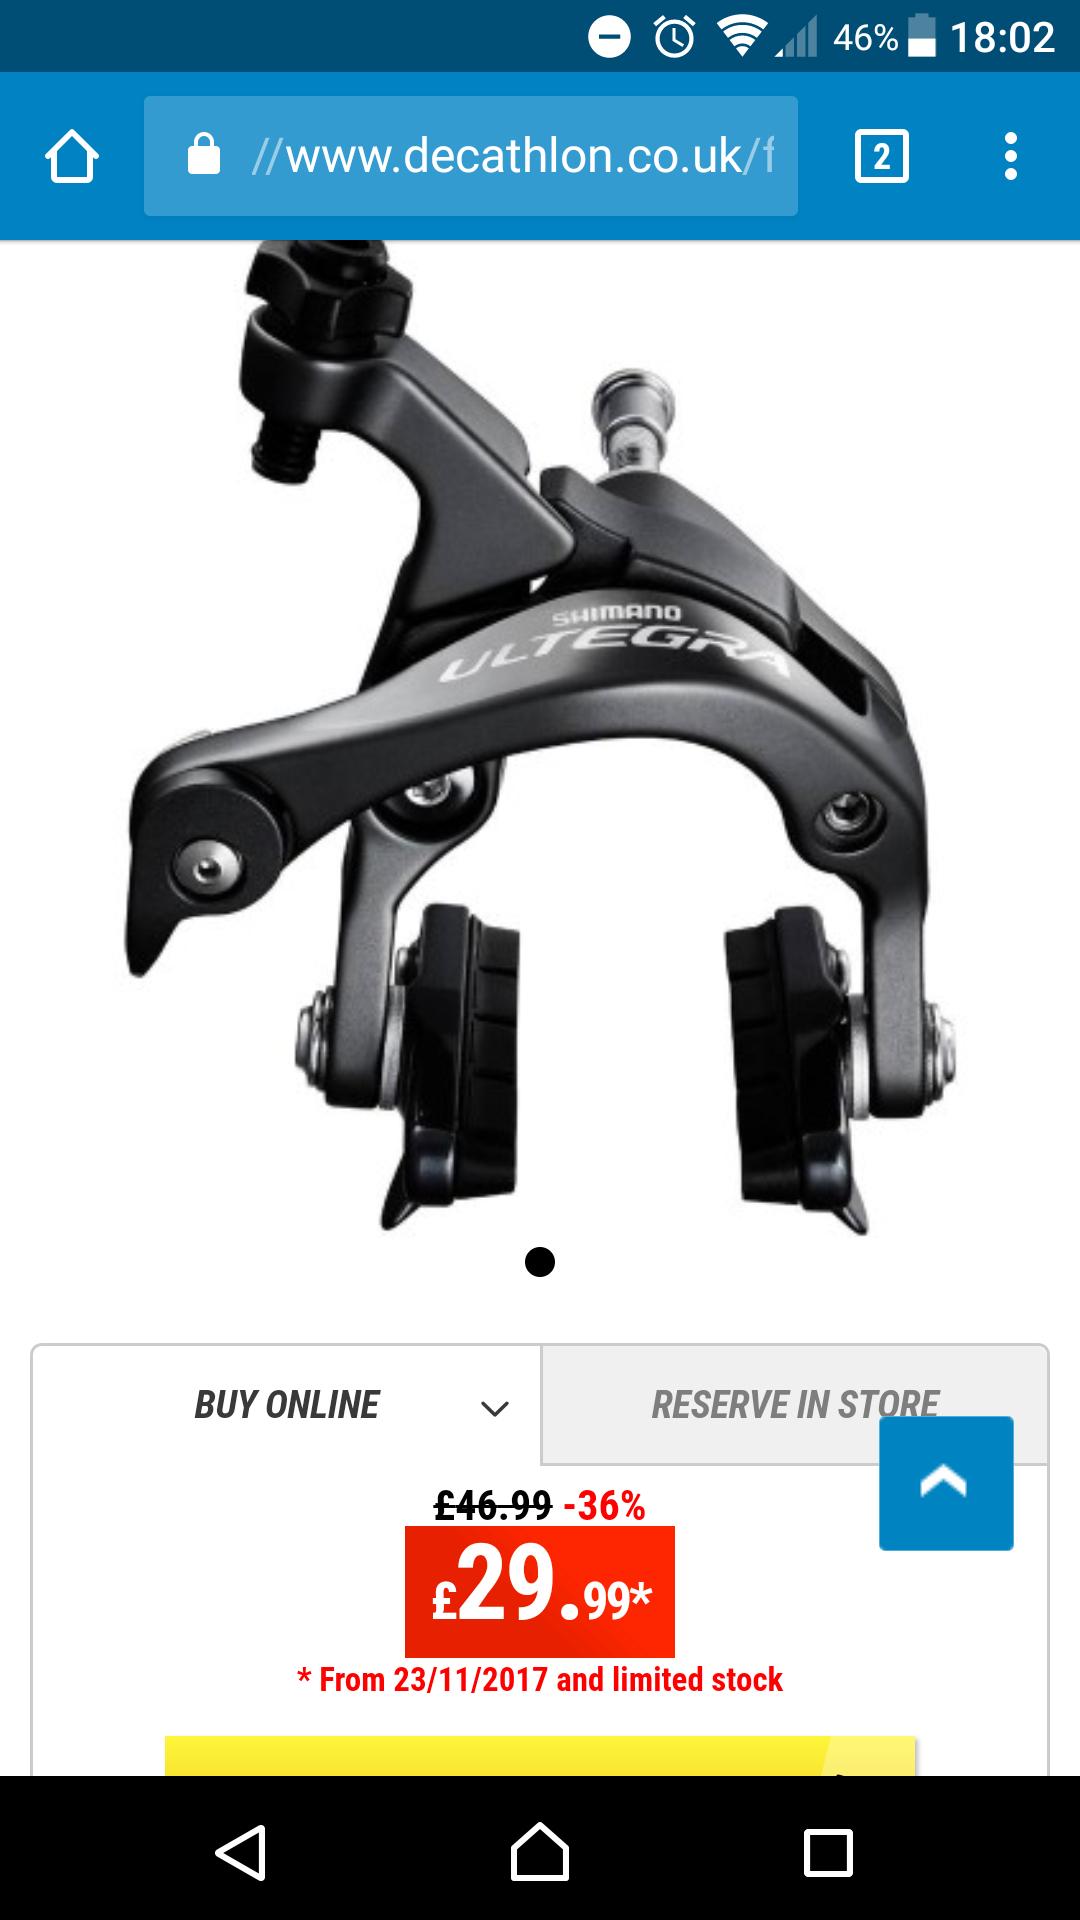 shimano ultegra brake caliper £29.99 @ Decathlon